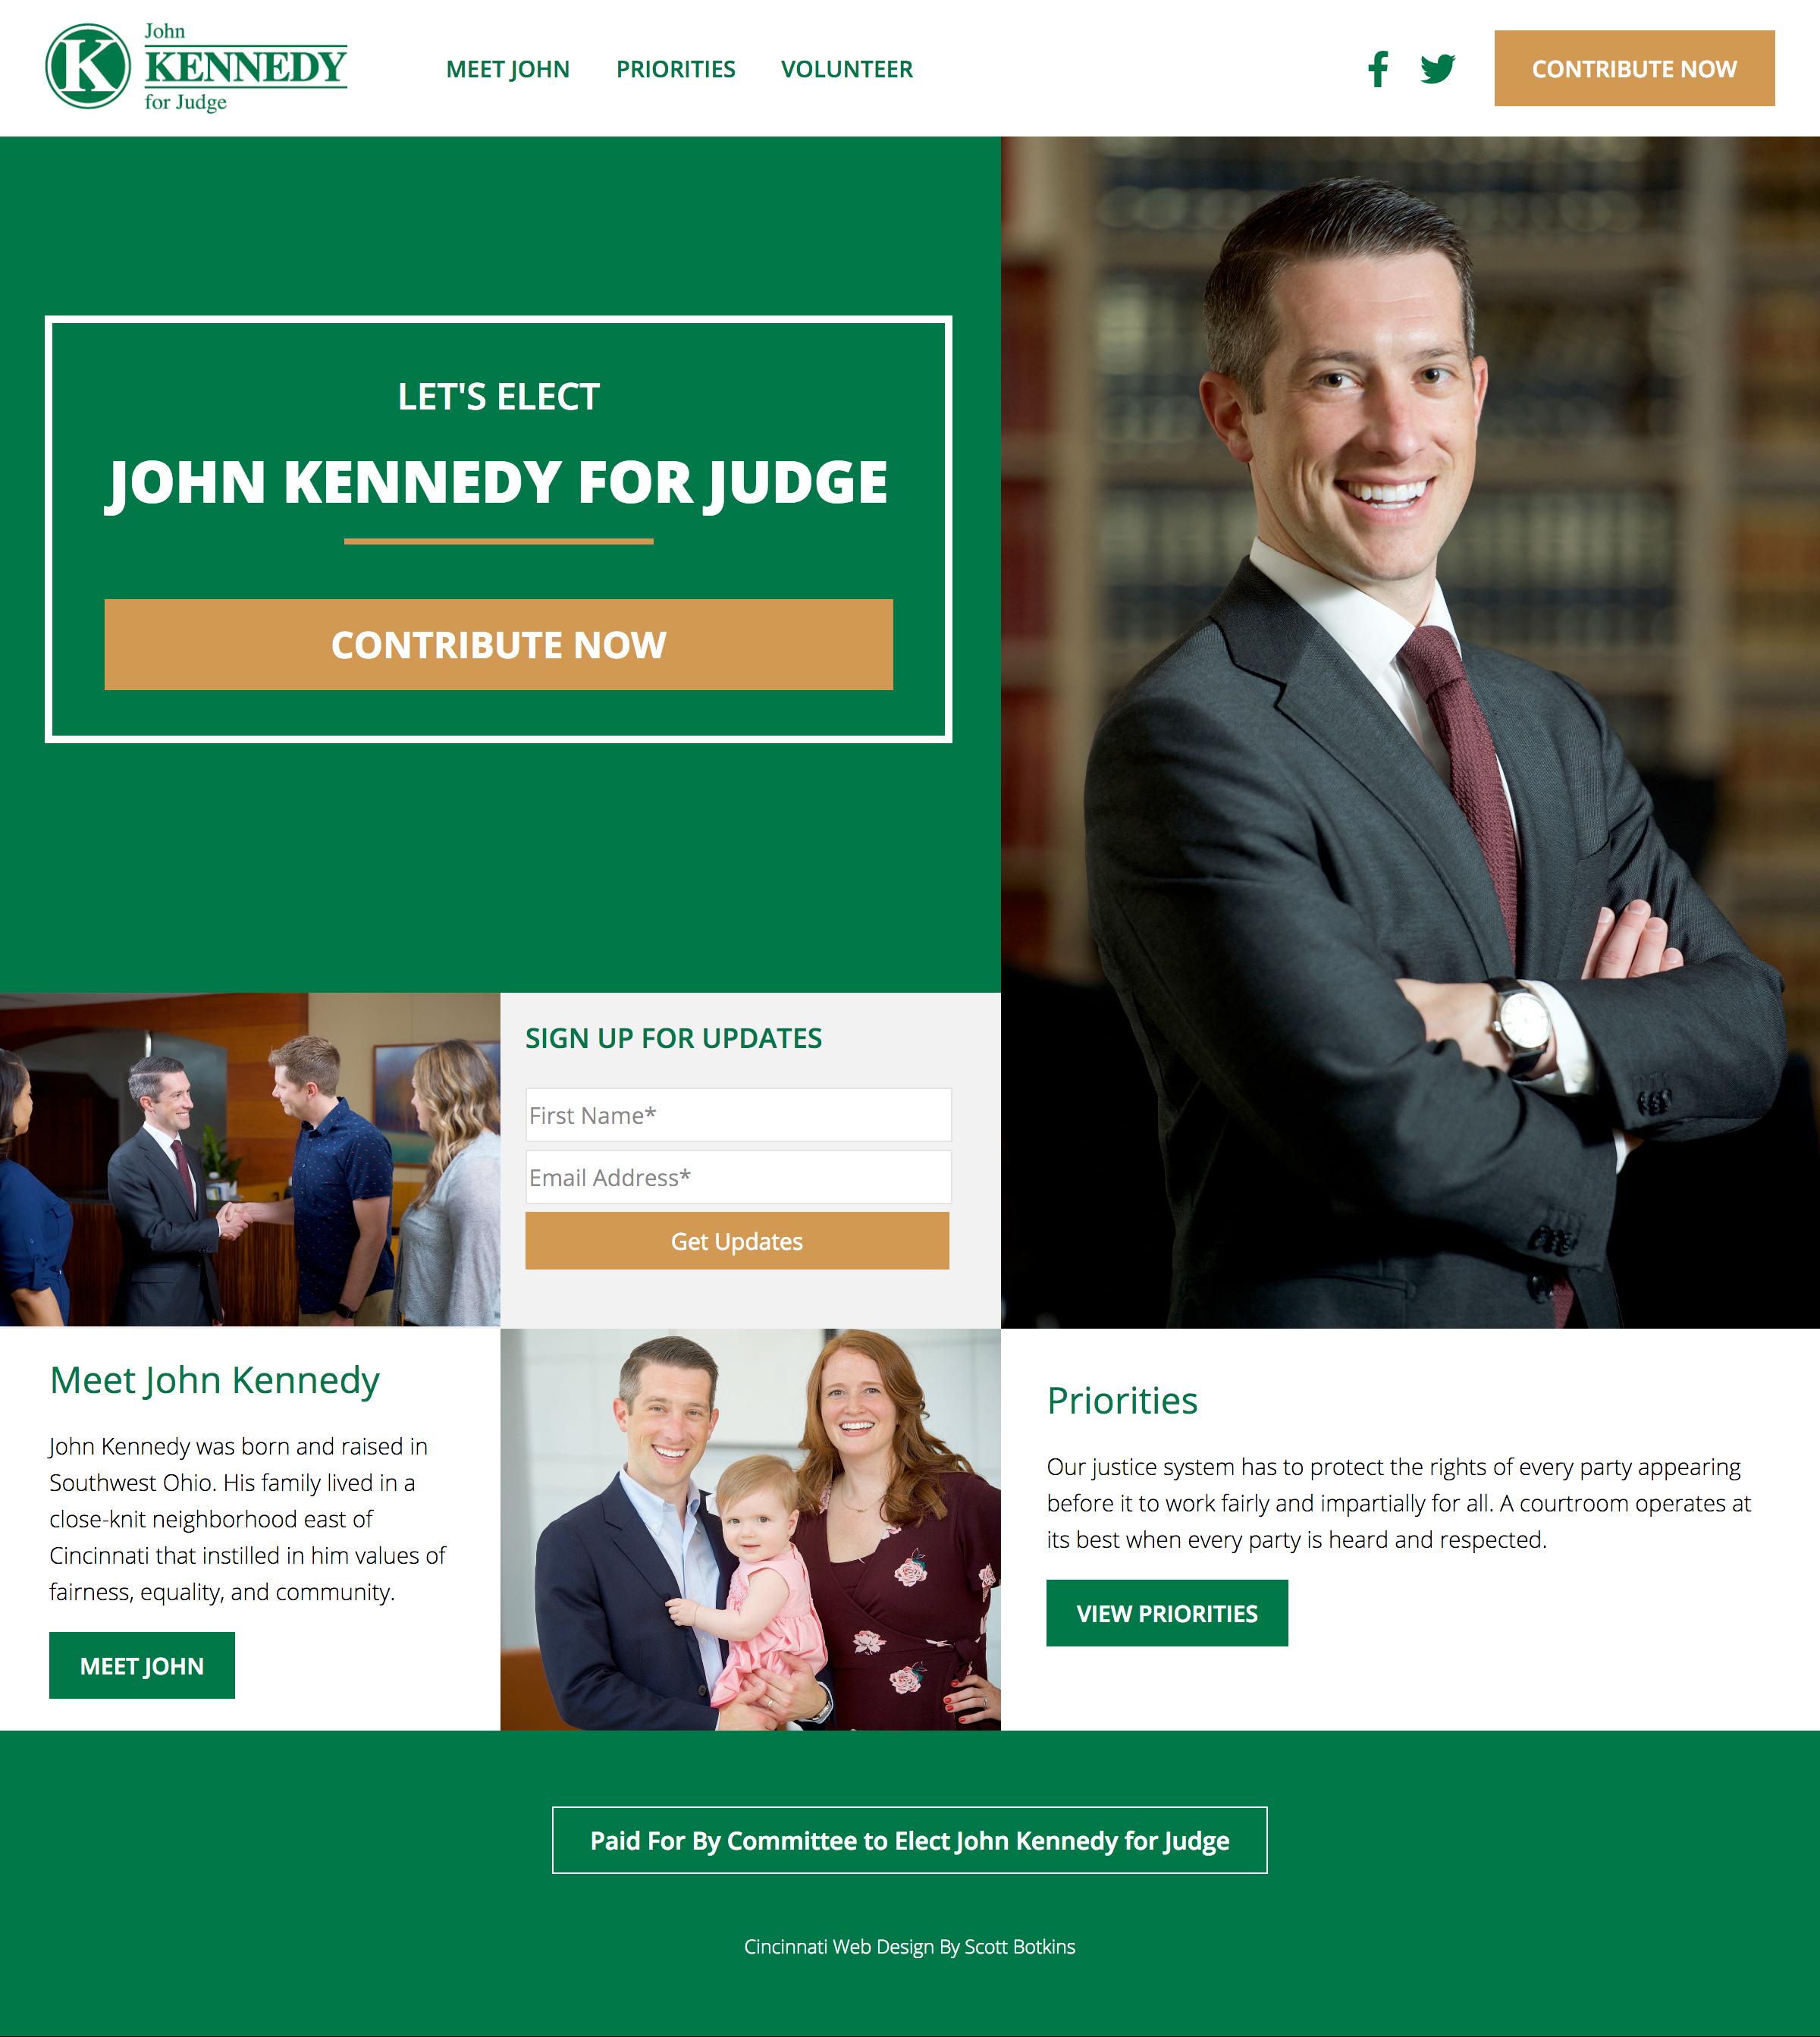 John Kennedy For Judge